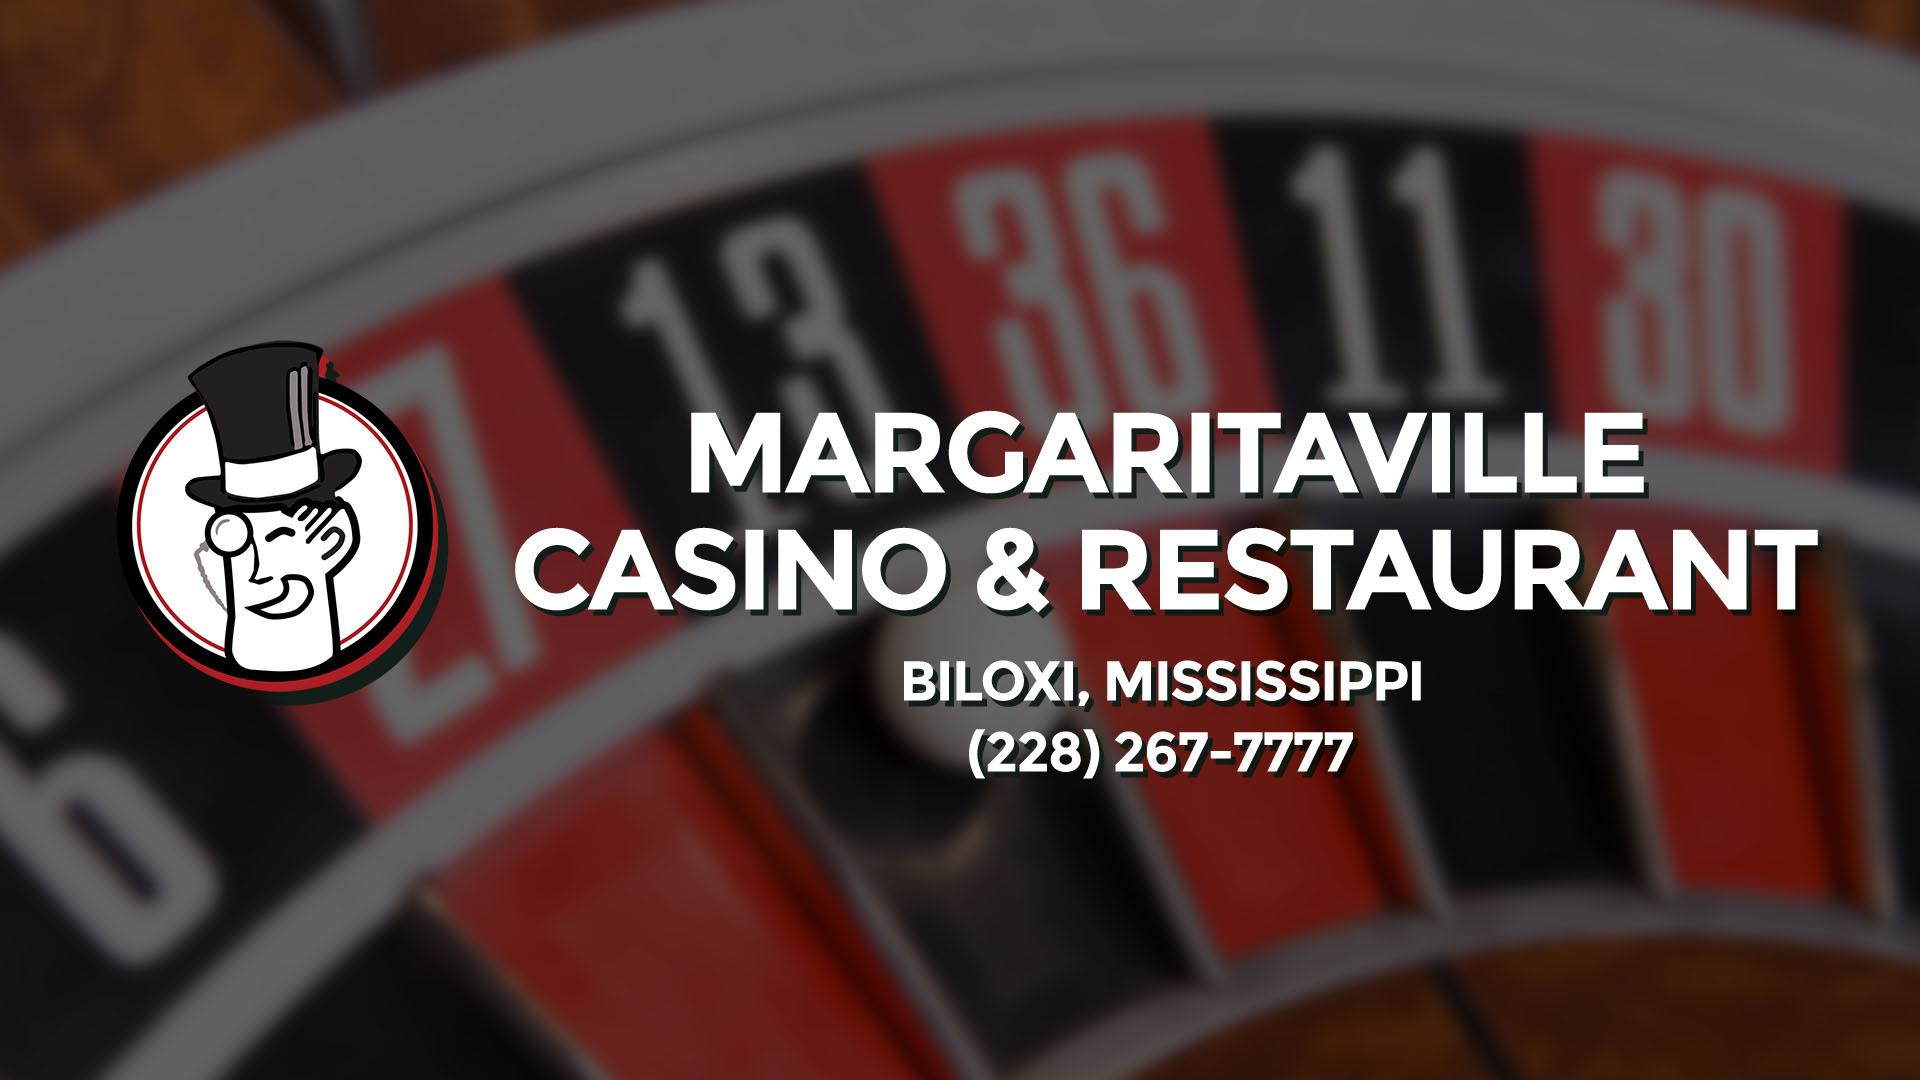 Barons Bus Casino Headers 2054 Margaritaville Casino Rstrnt Biloxi